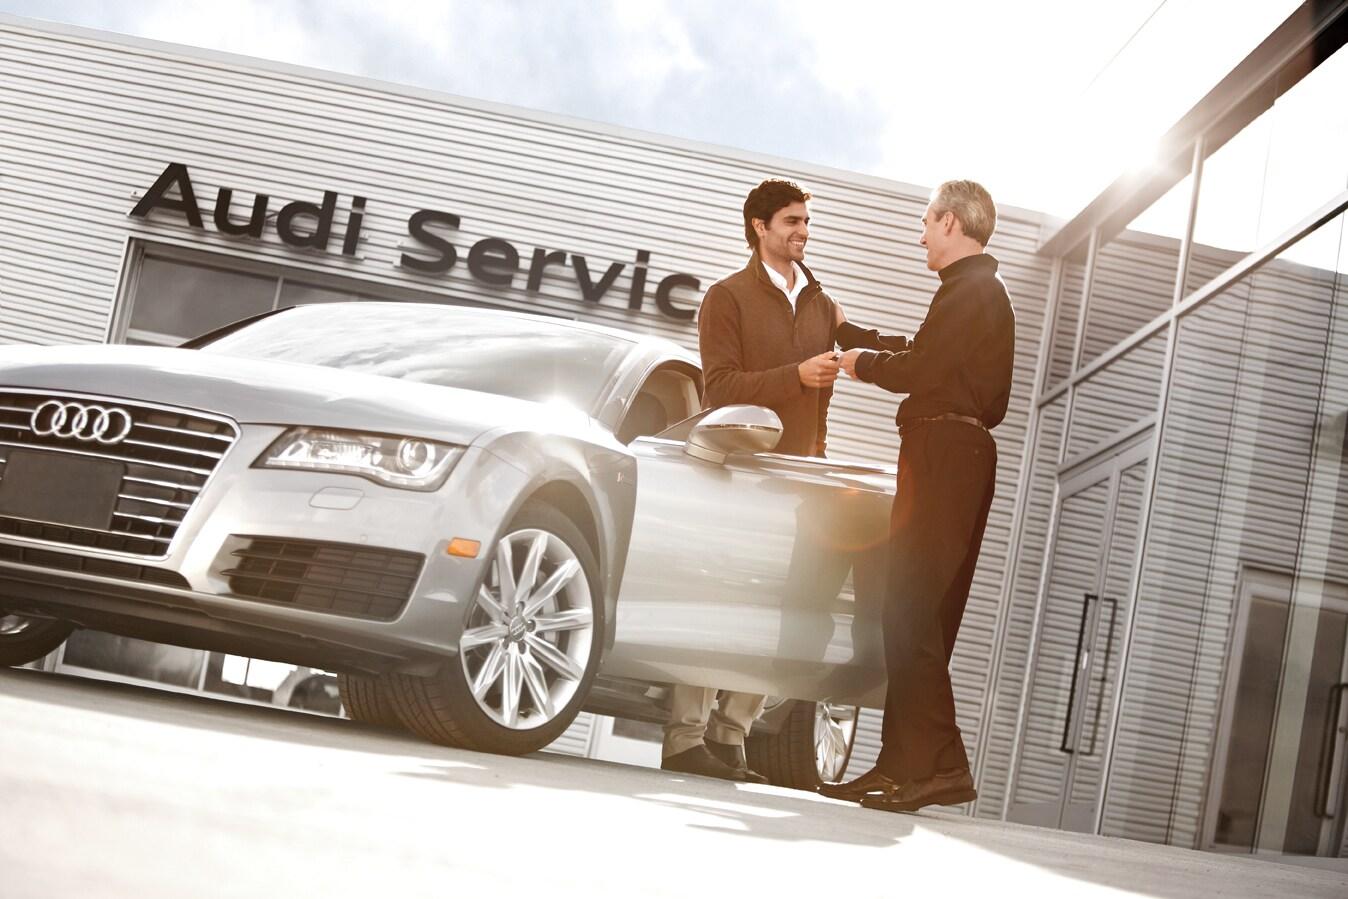 Image Gallery Audi Service